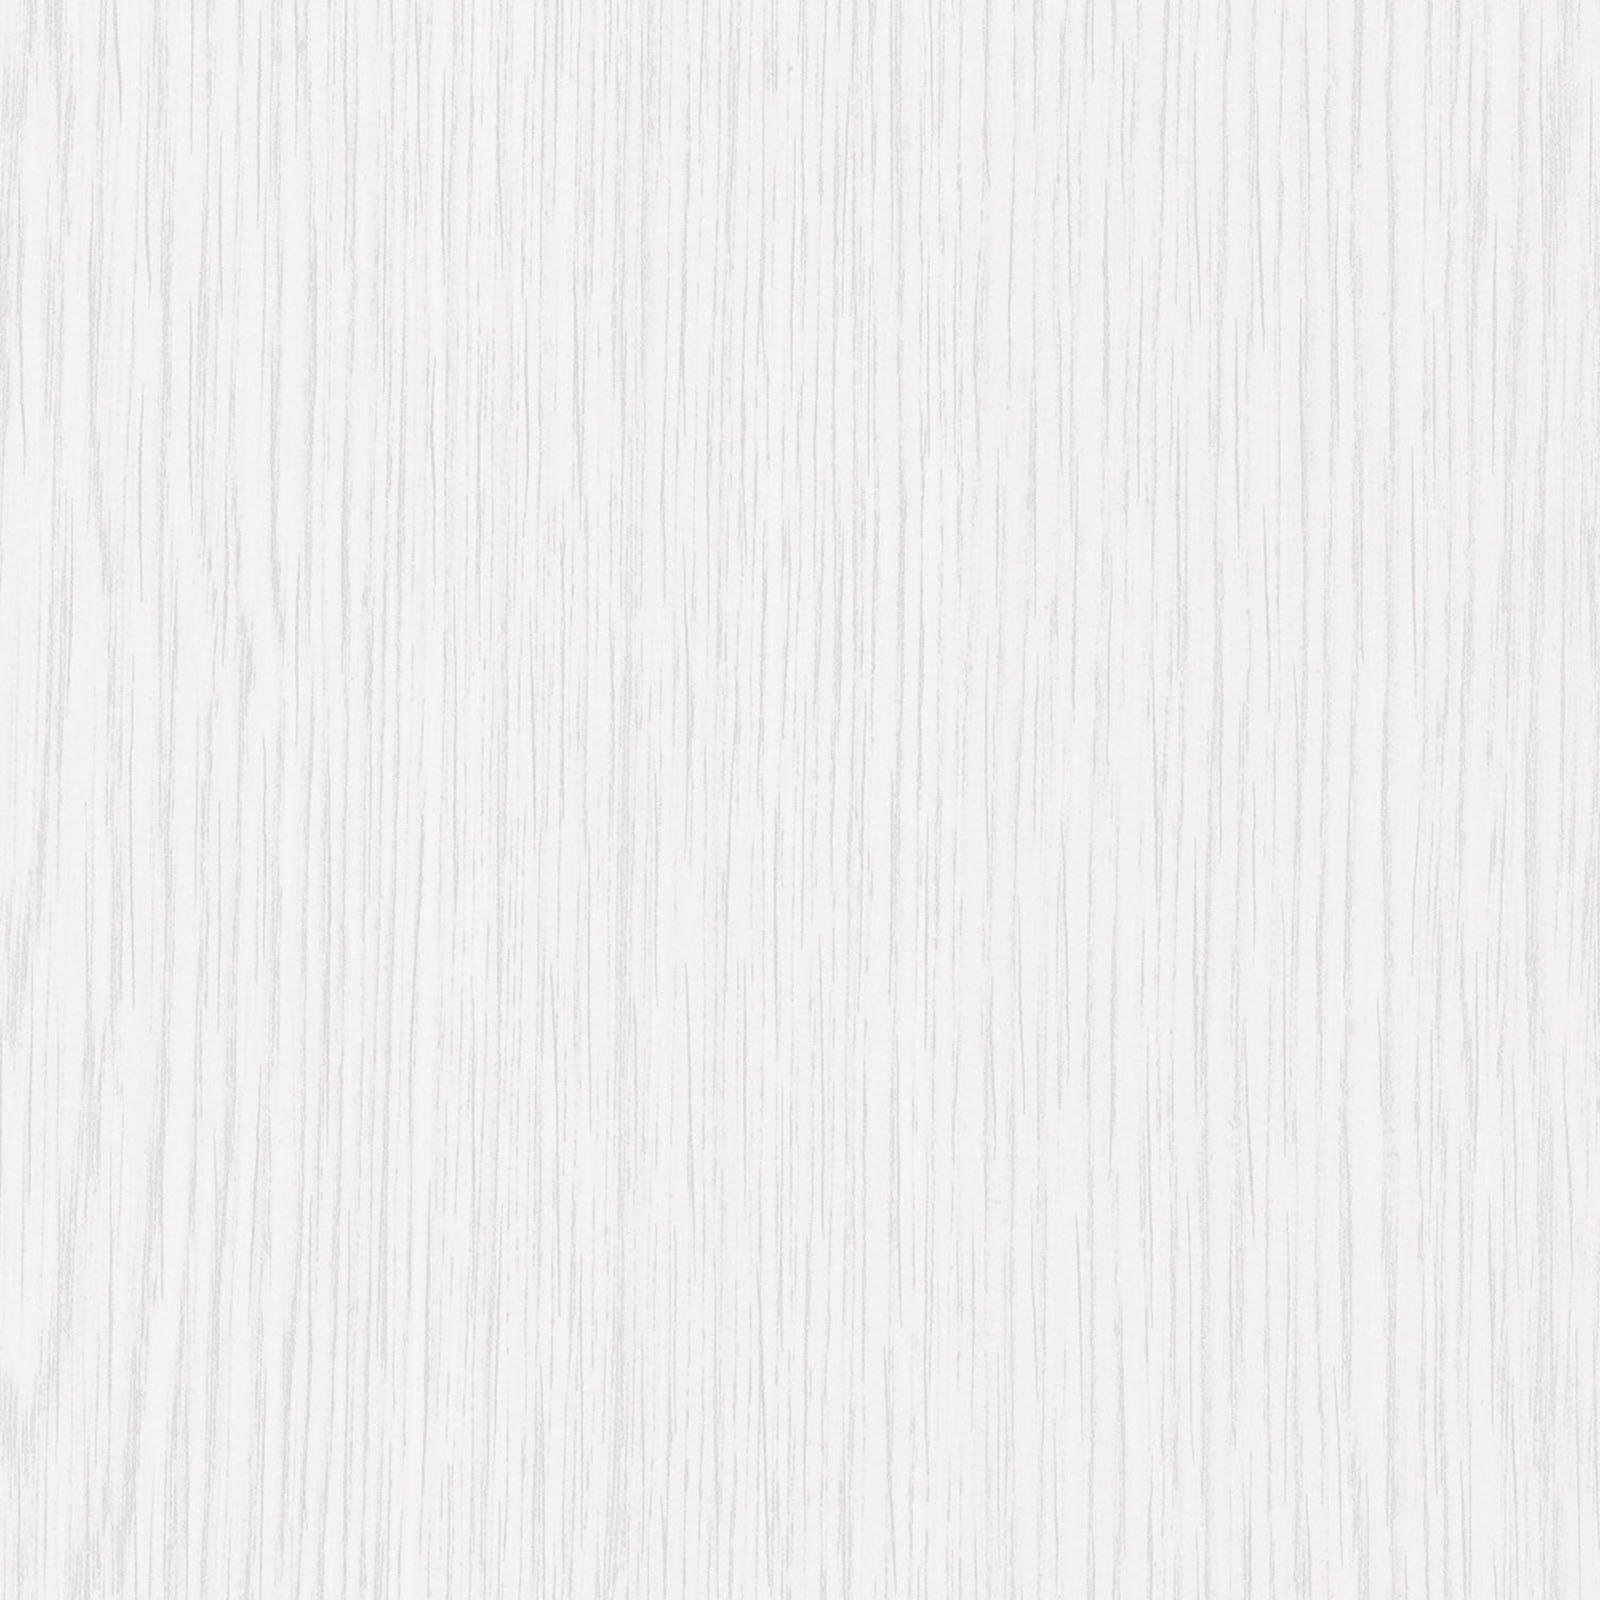 m belfolie whitewood wei 67 5x200 cm dekor. Black Bedroom Furniture Sets. Home Design Ideas